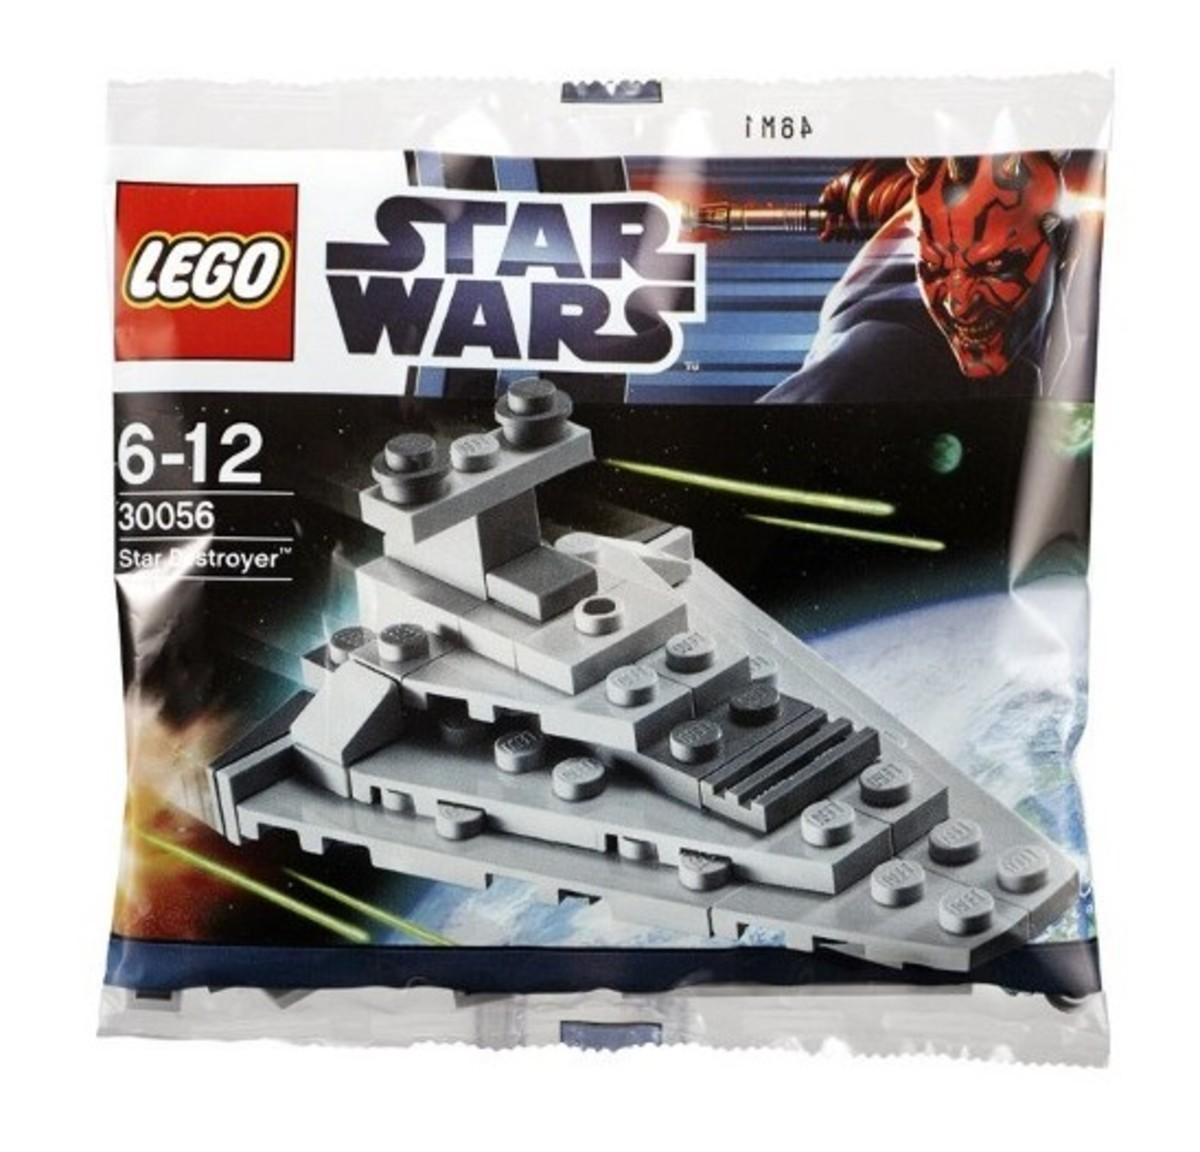 LEGO Star Wars Star Destroyer 30056 Bag